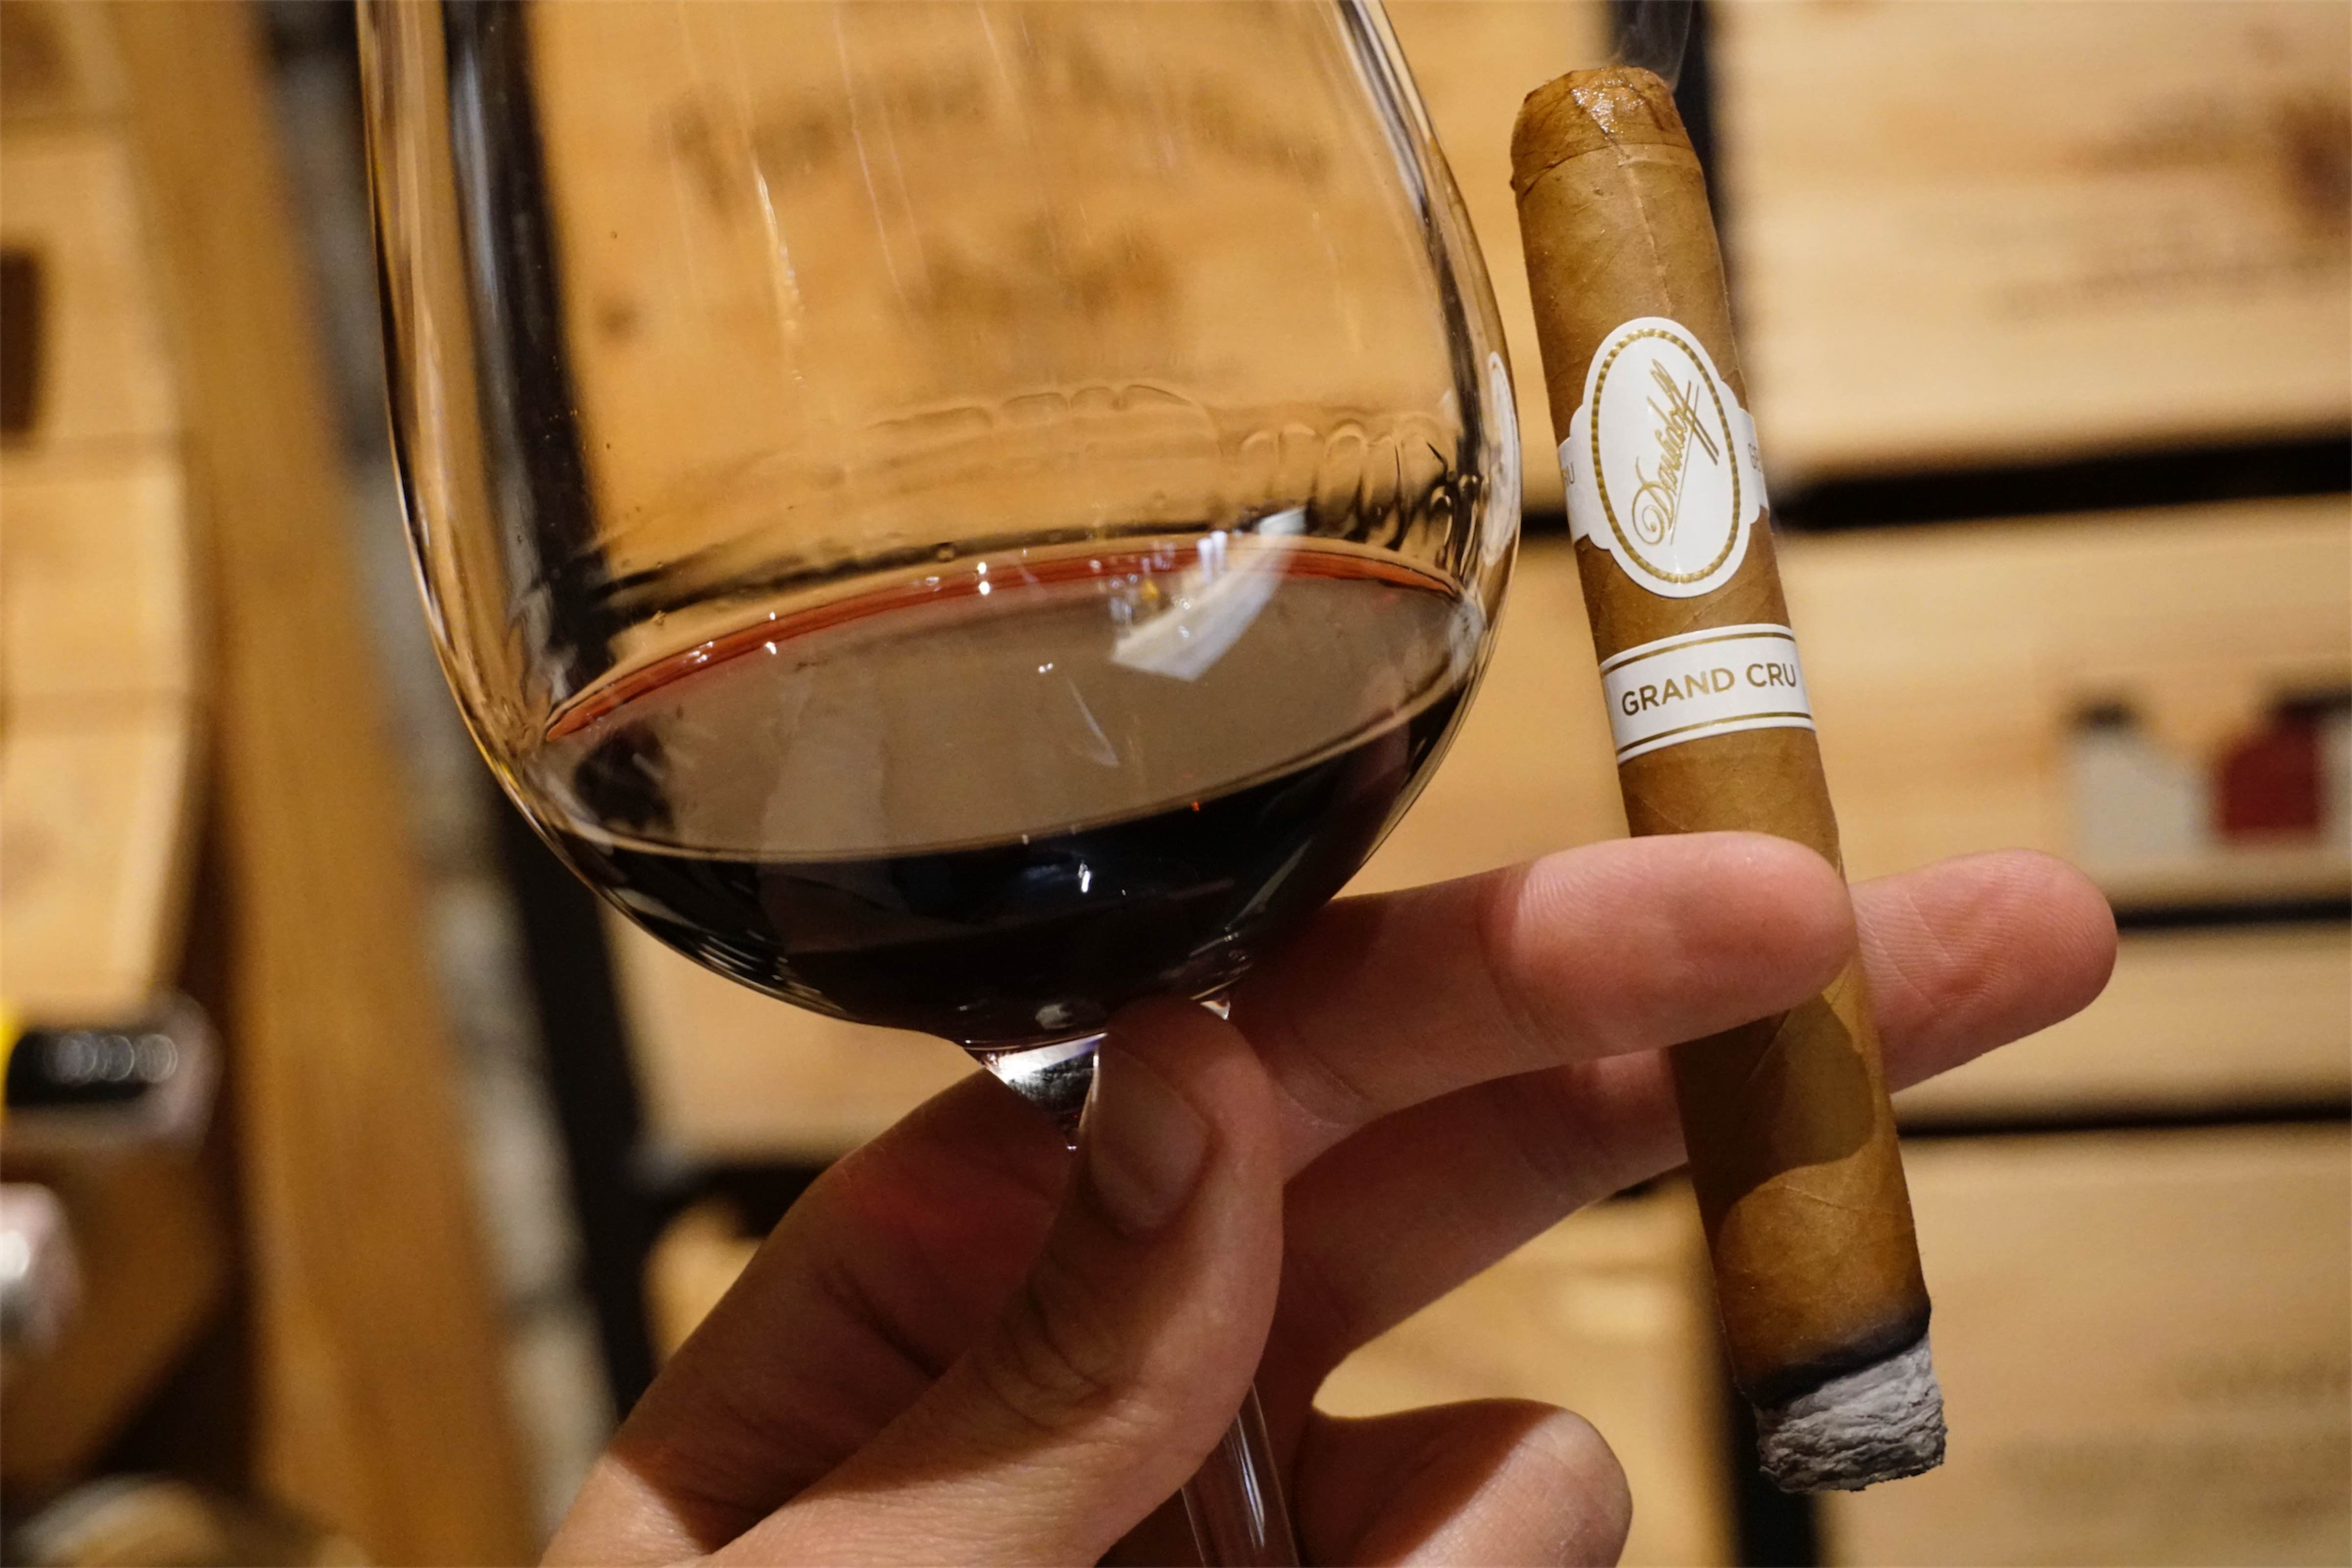 Cygaro i wino - Davidoff Grand Cru - Manufaktura Marzeń